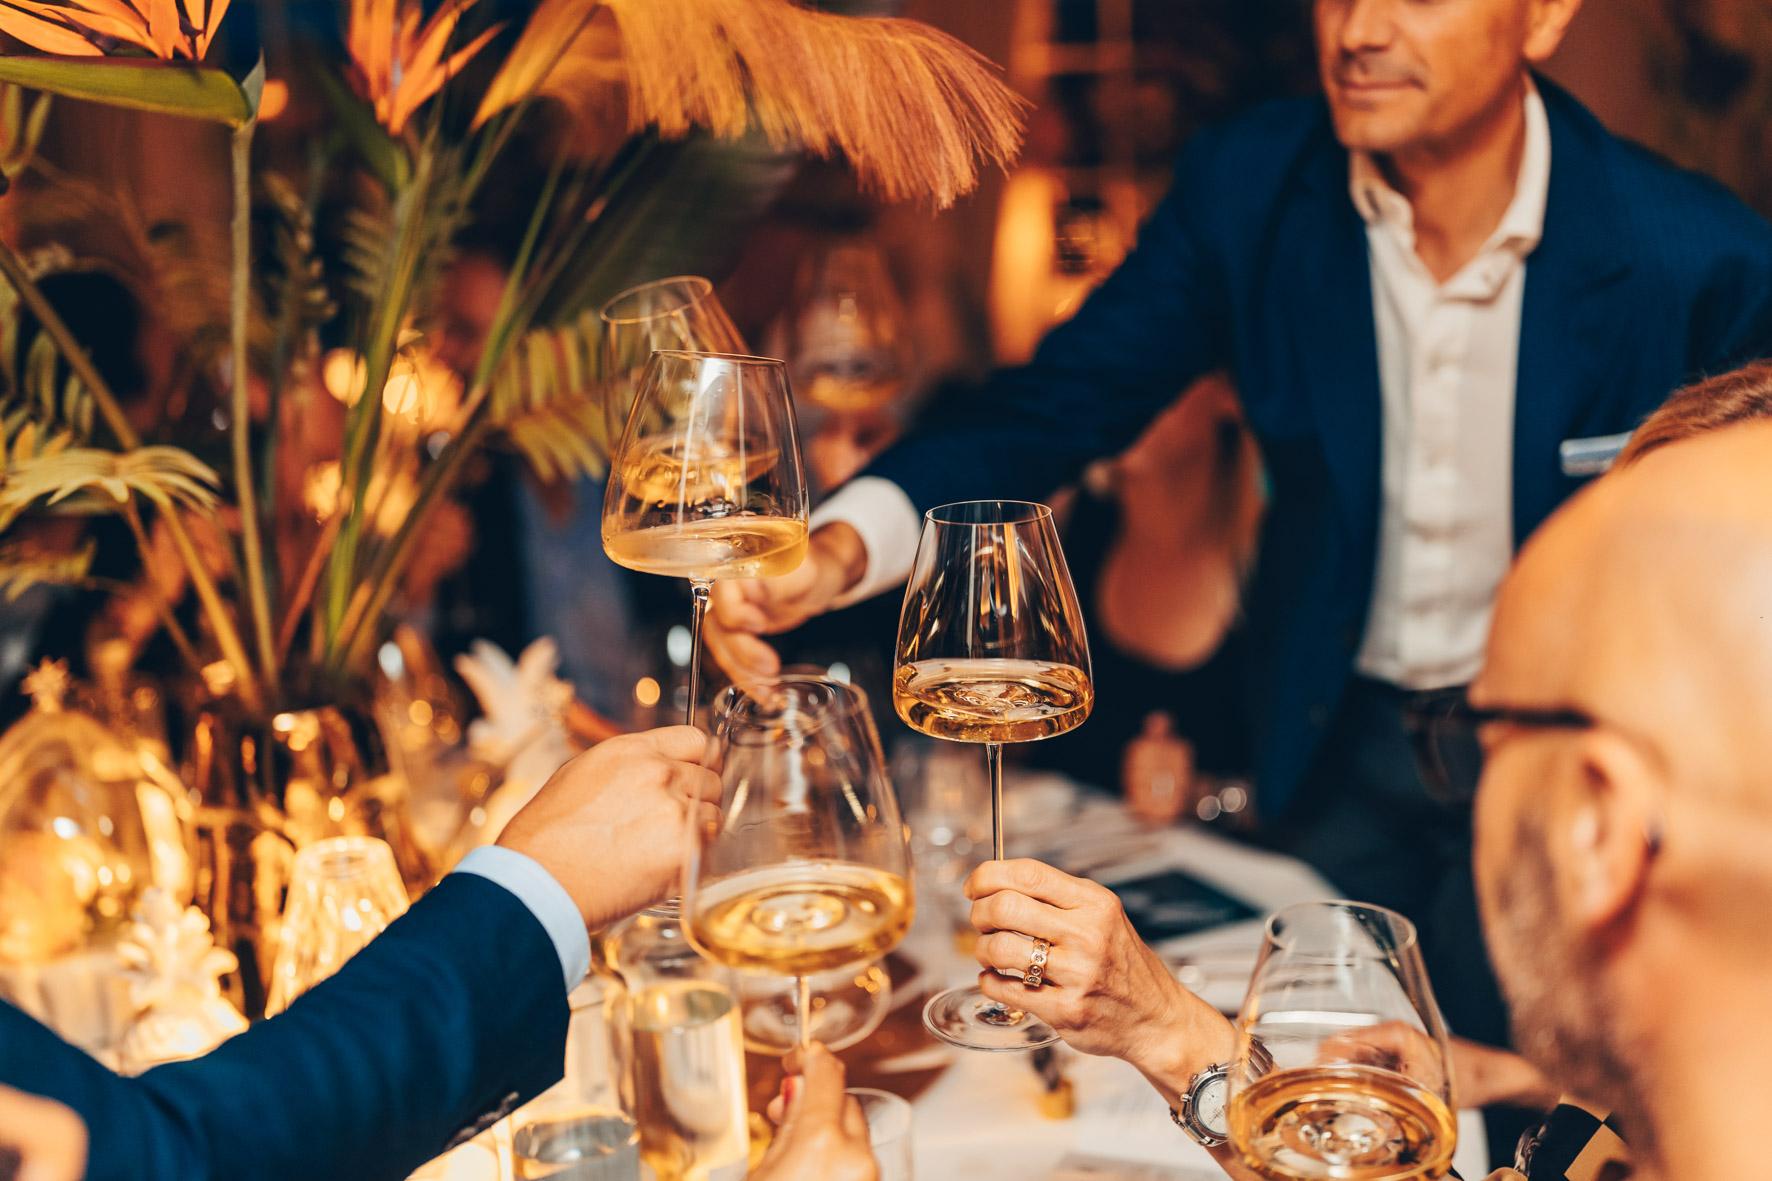 Konrad-lifestyle-art-basel-%22gold-member-experience%22-2019-101.jpg